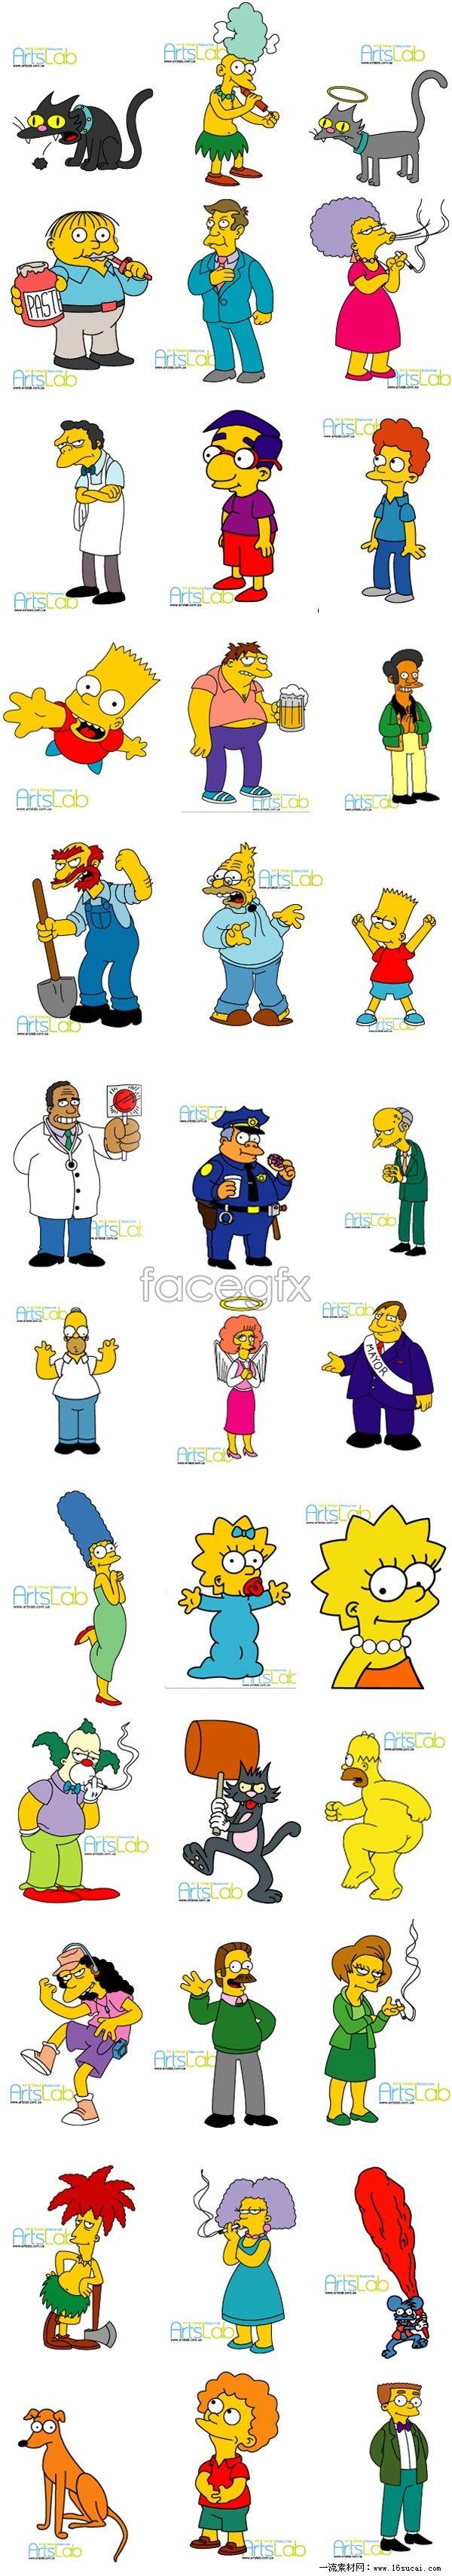 Adorable Simpsons cartoon vector